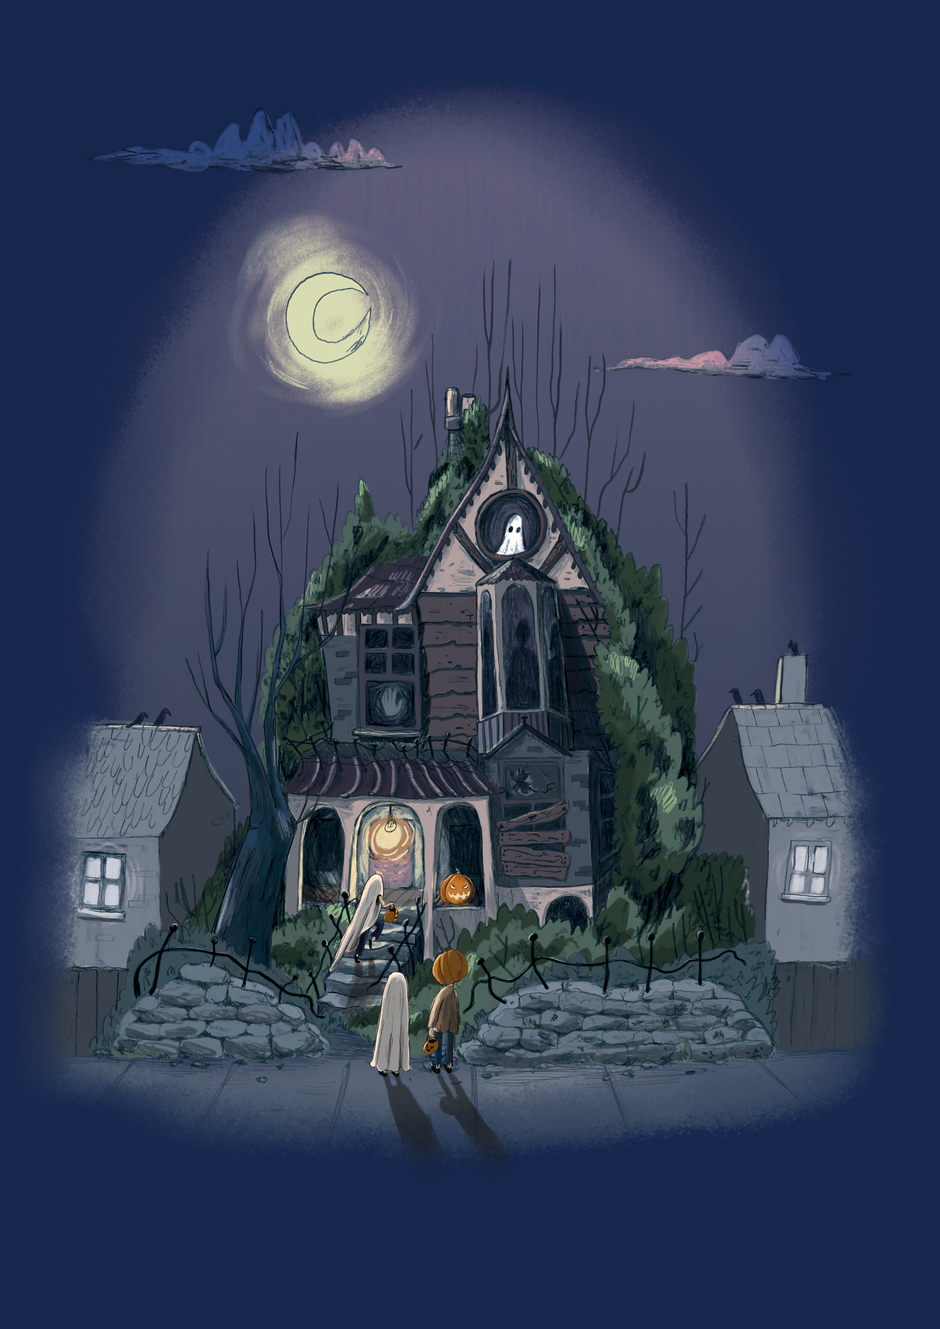 Spooky House 🎃